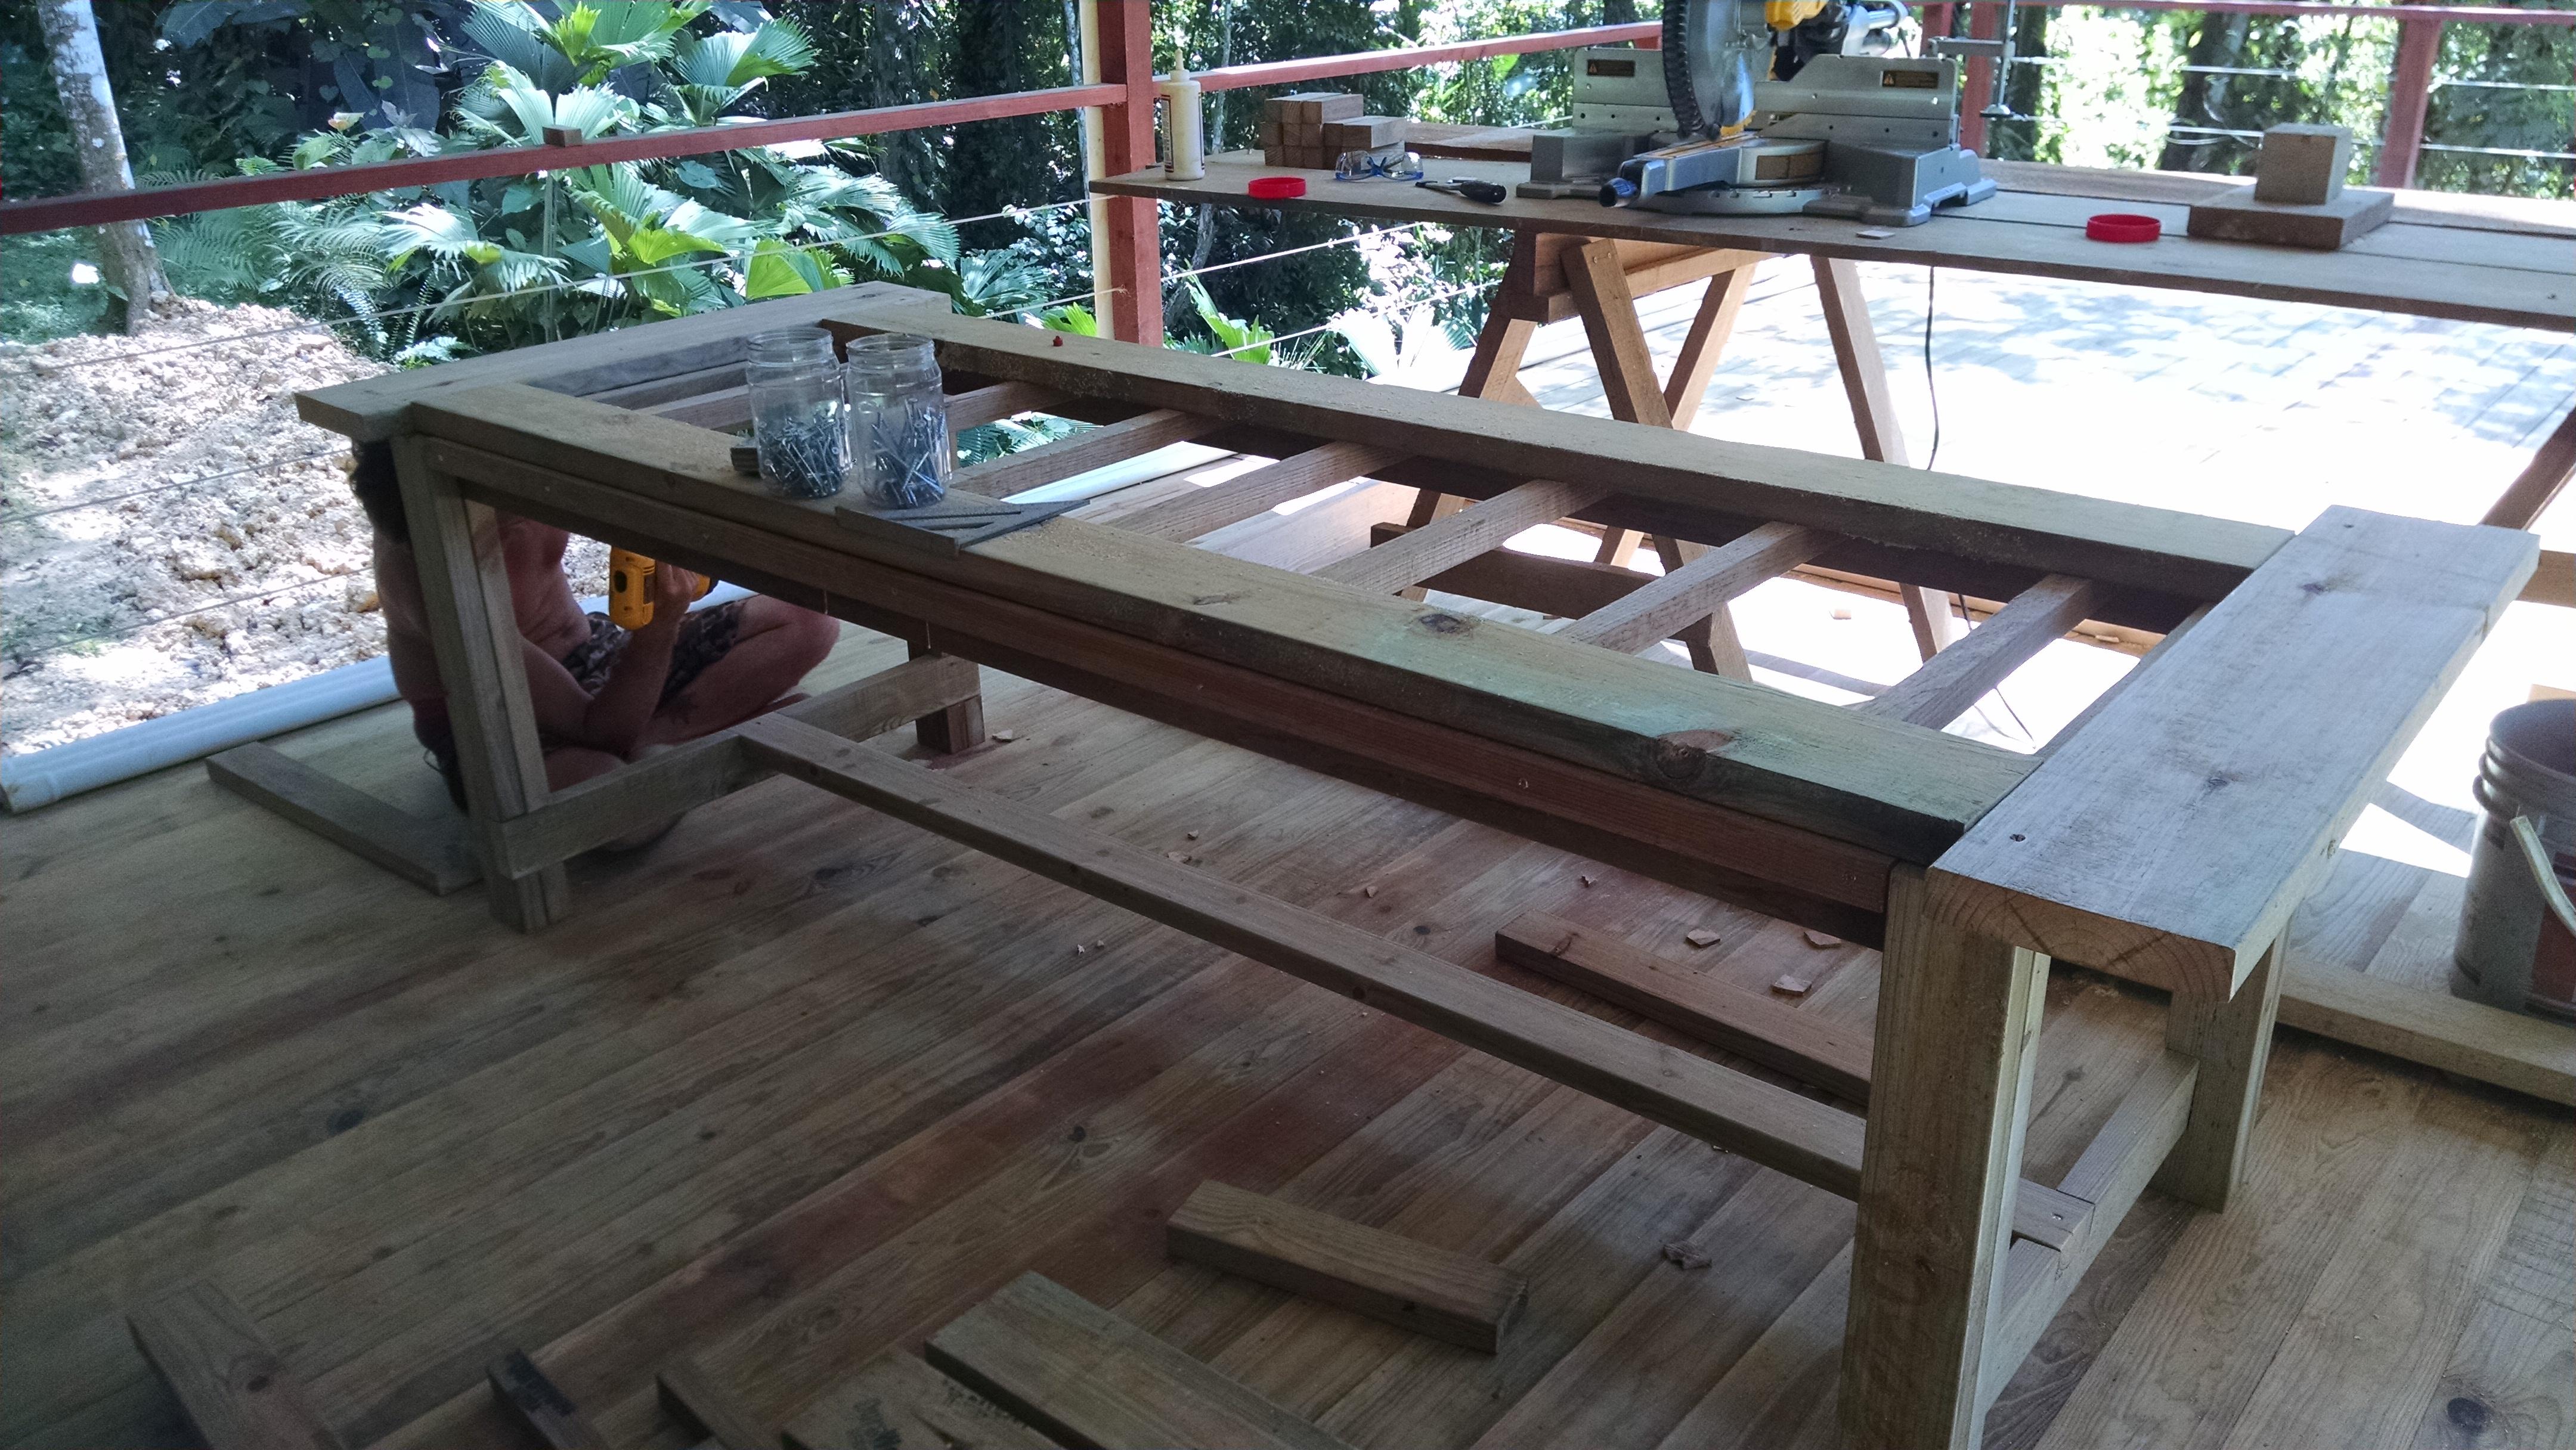 Photo of New restaurant table in progress